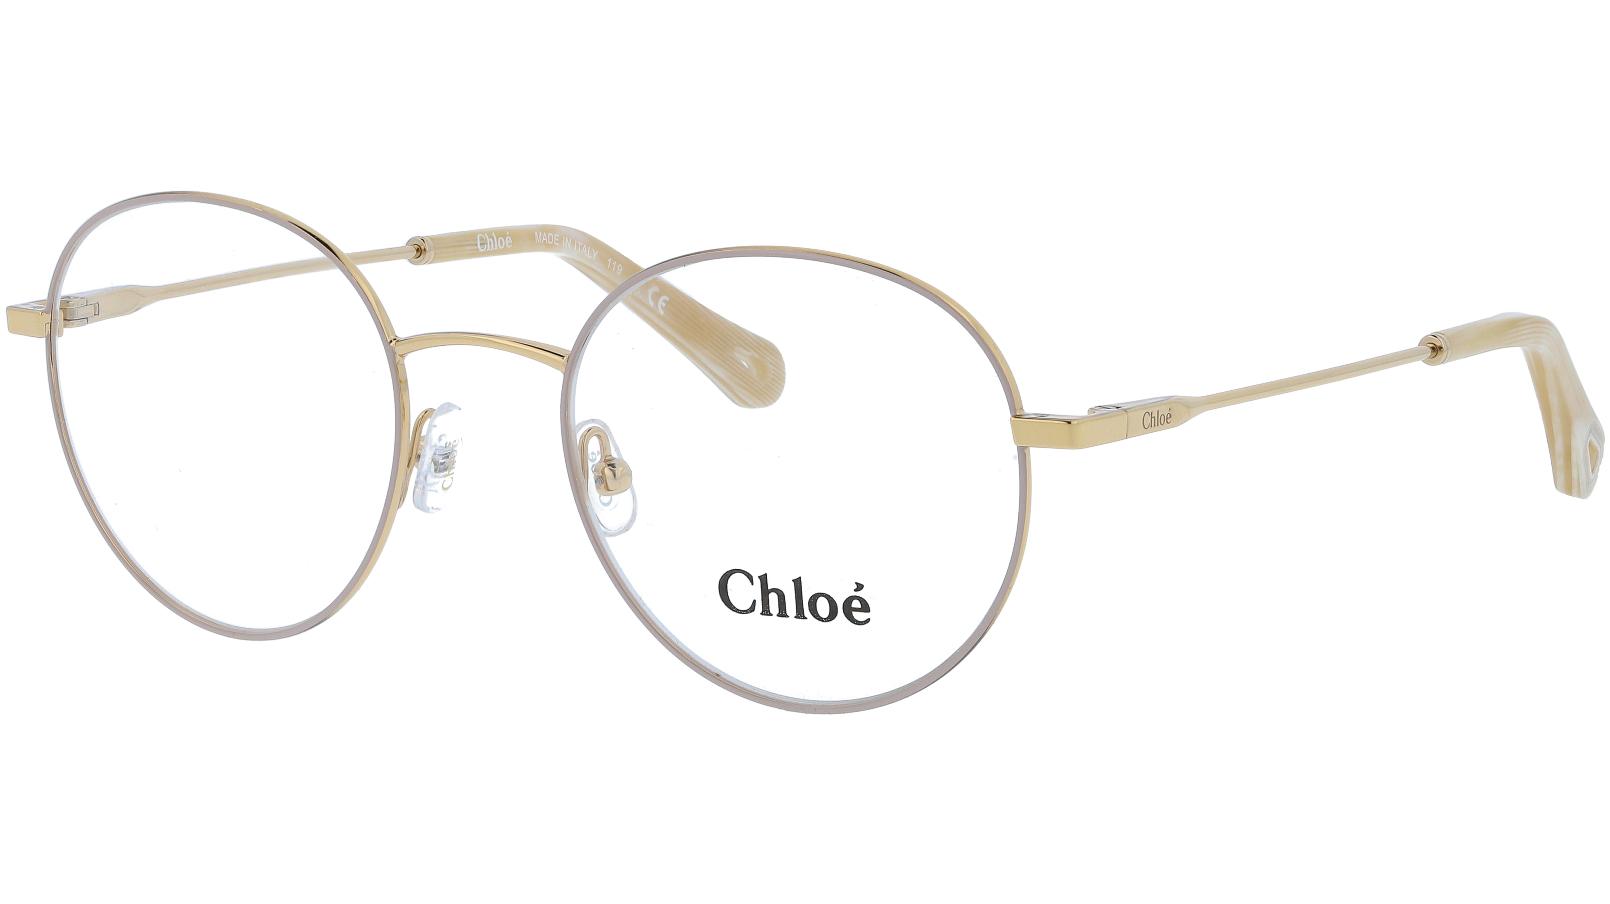 CHLOE CE2136 743 50 GOLD Glasses